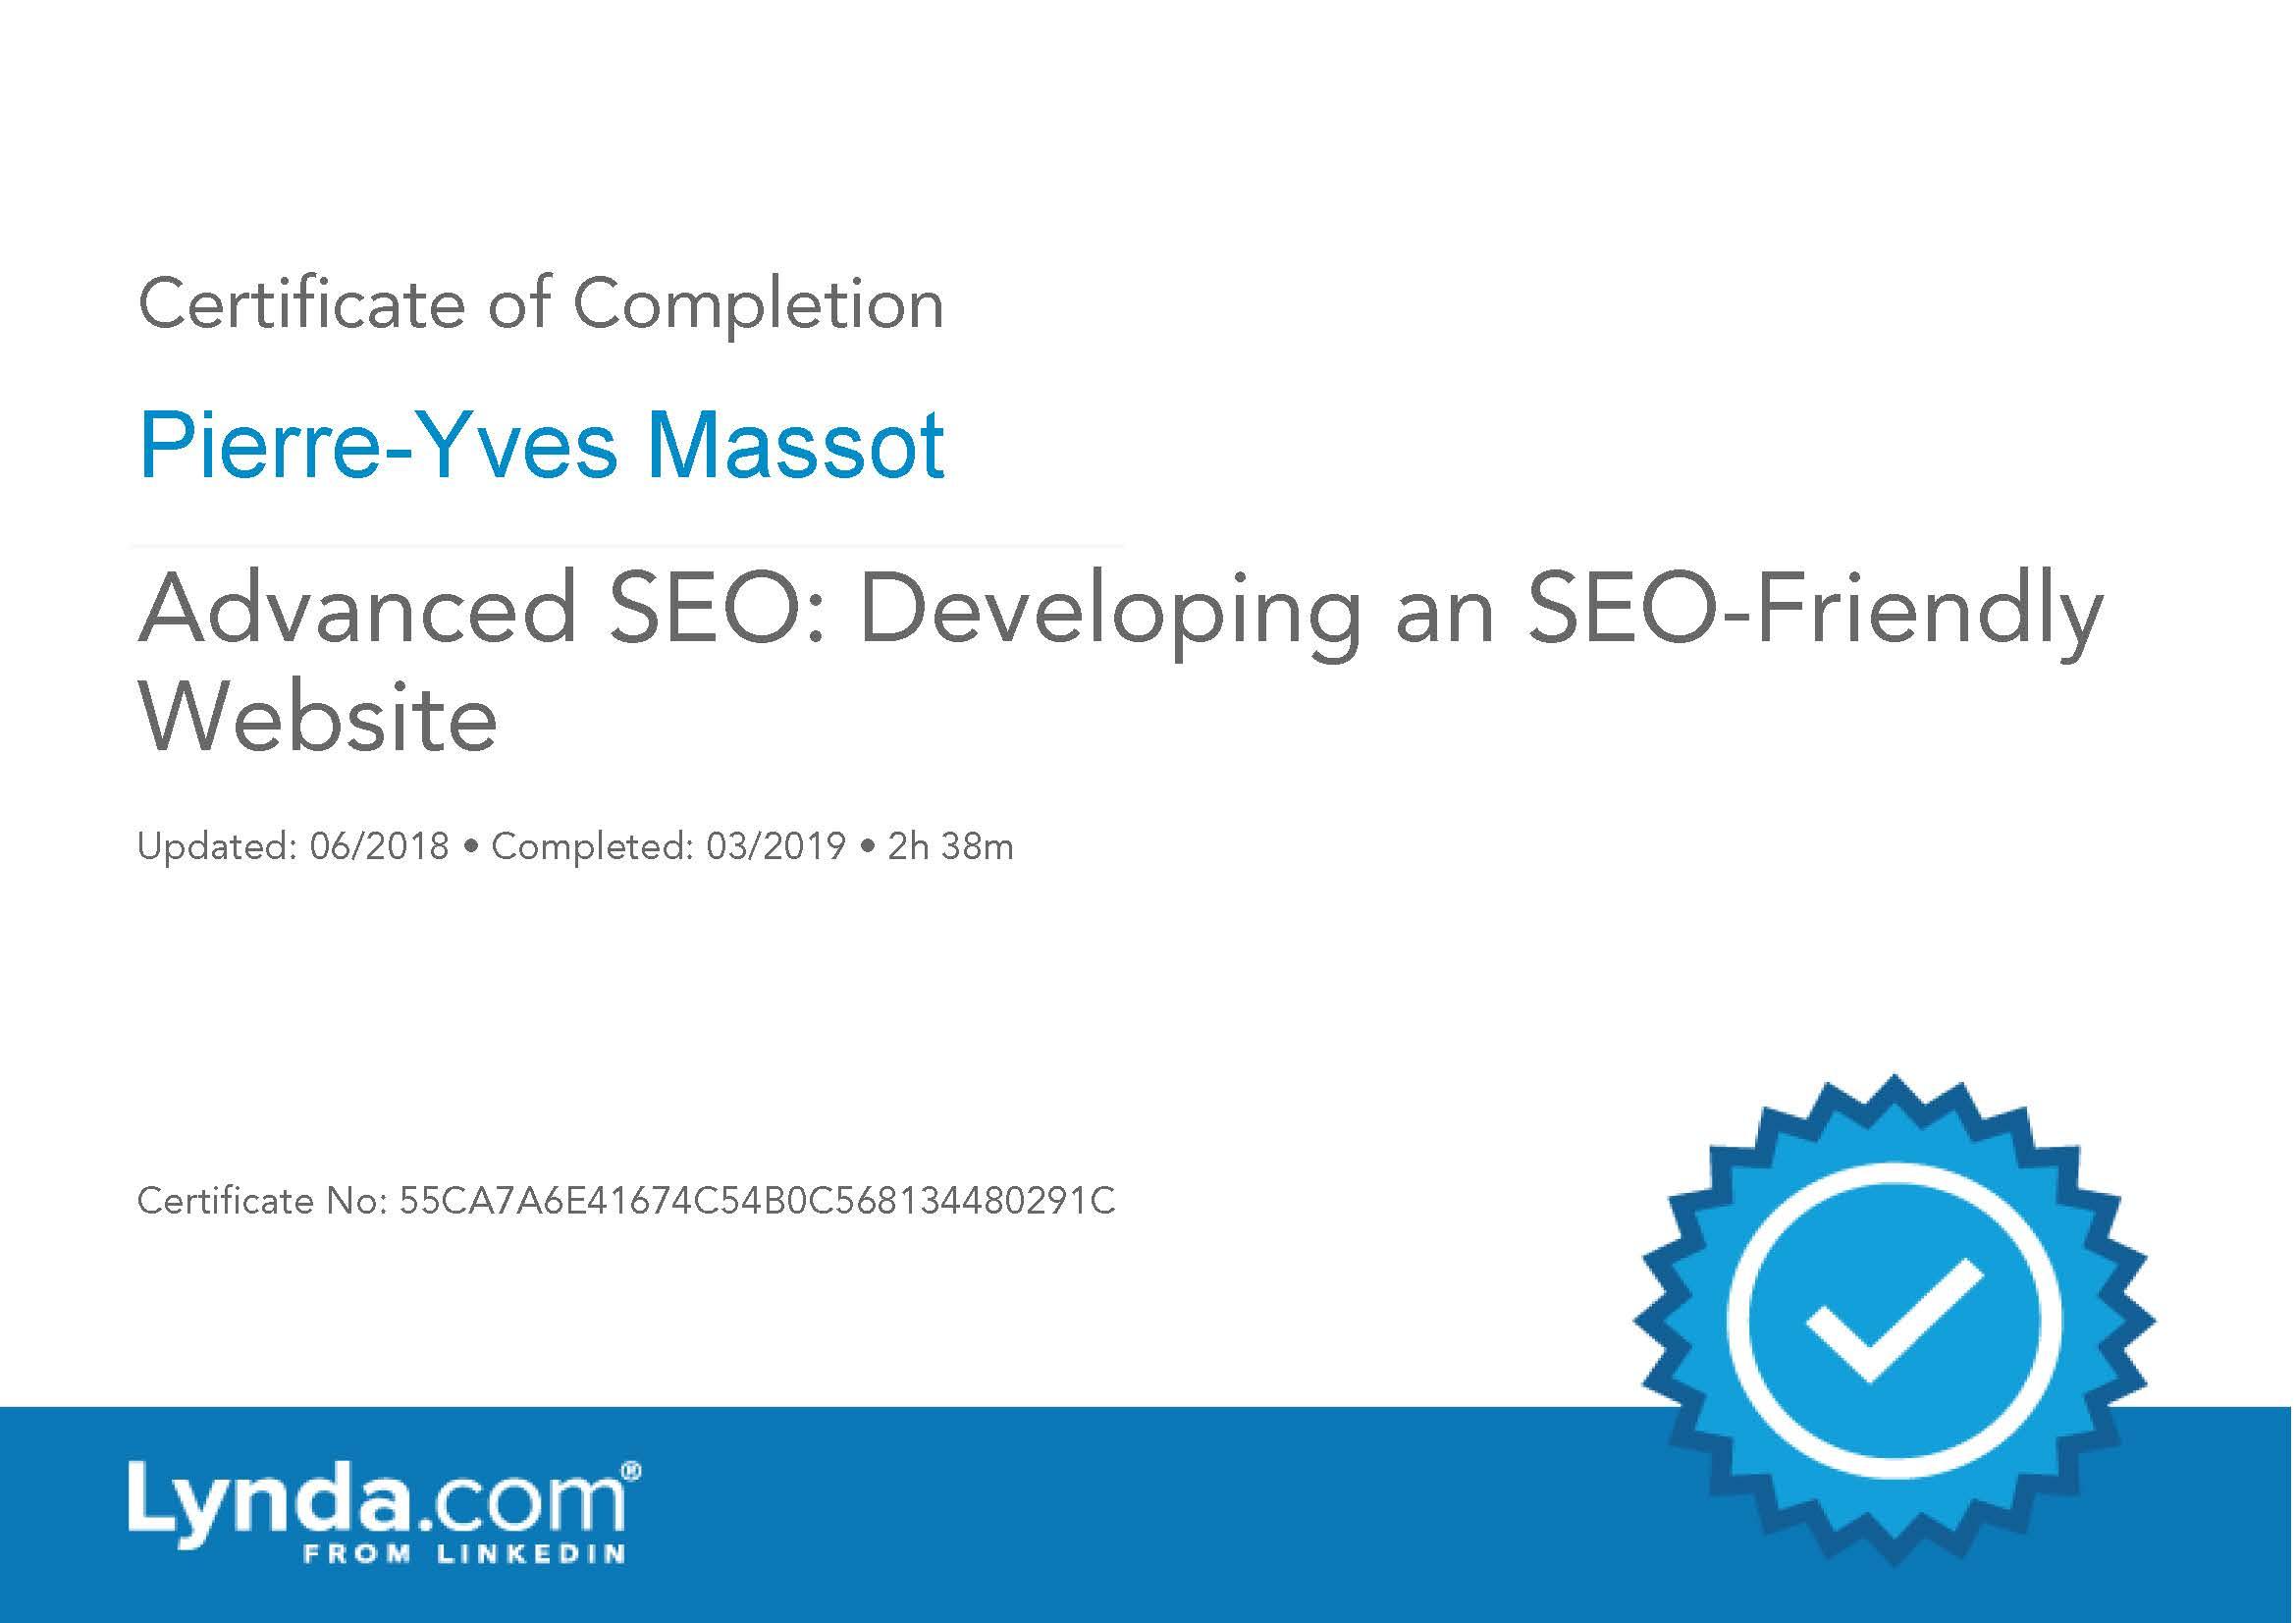 advanced-seo-friendly-website-pierre-yves-massot.jpg